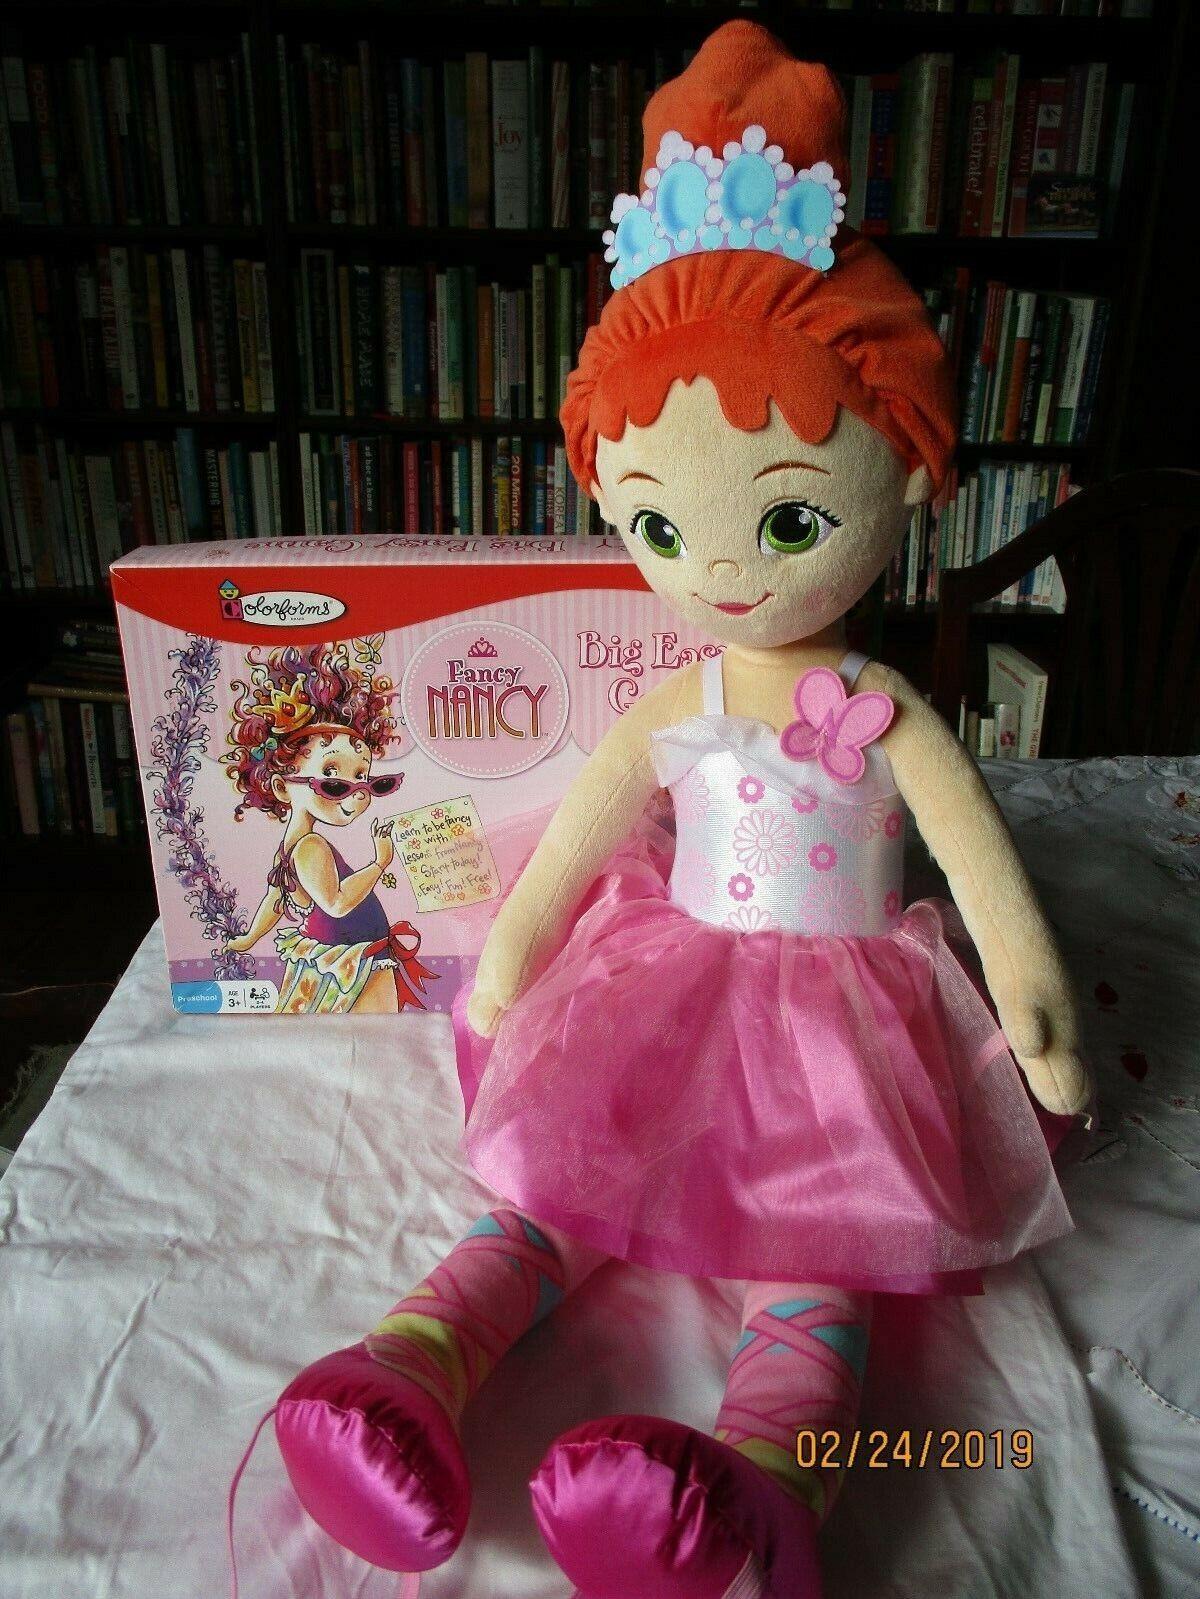 Fancy Nancy gree Easy gioco by Coloreeforms & Dance  with me Btuttierina bambola  centro commerciale di moda